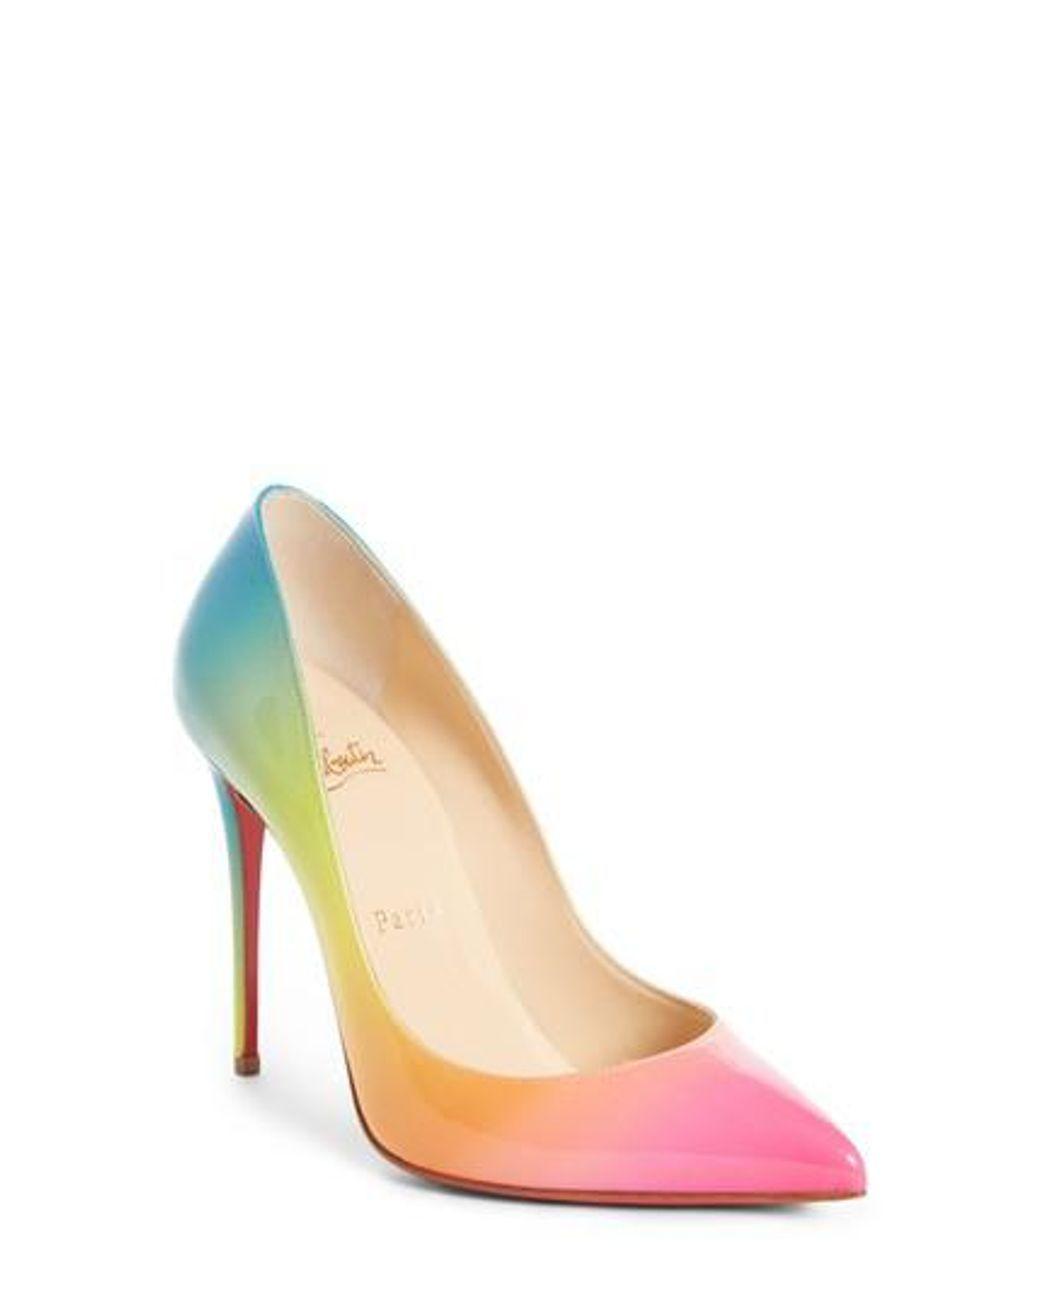 c0be5a45552 Christian Louboutin - Multicolor Rainbow Pigalle Follies Pump - Lyst ...